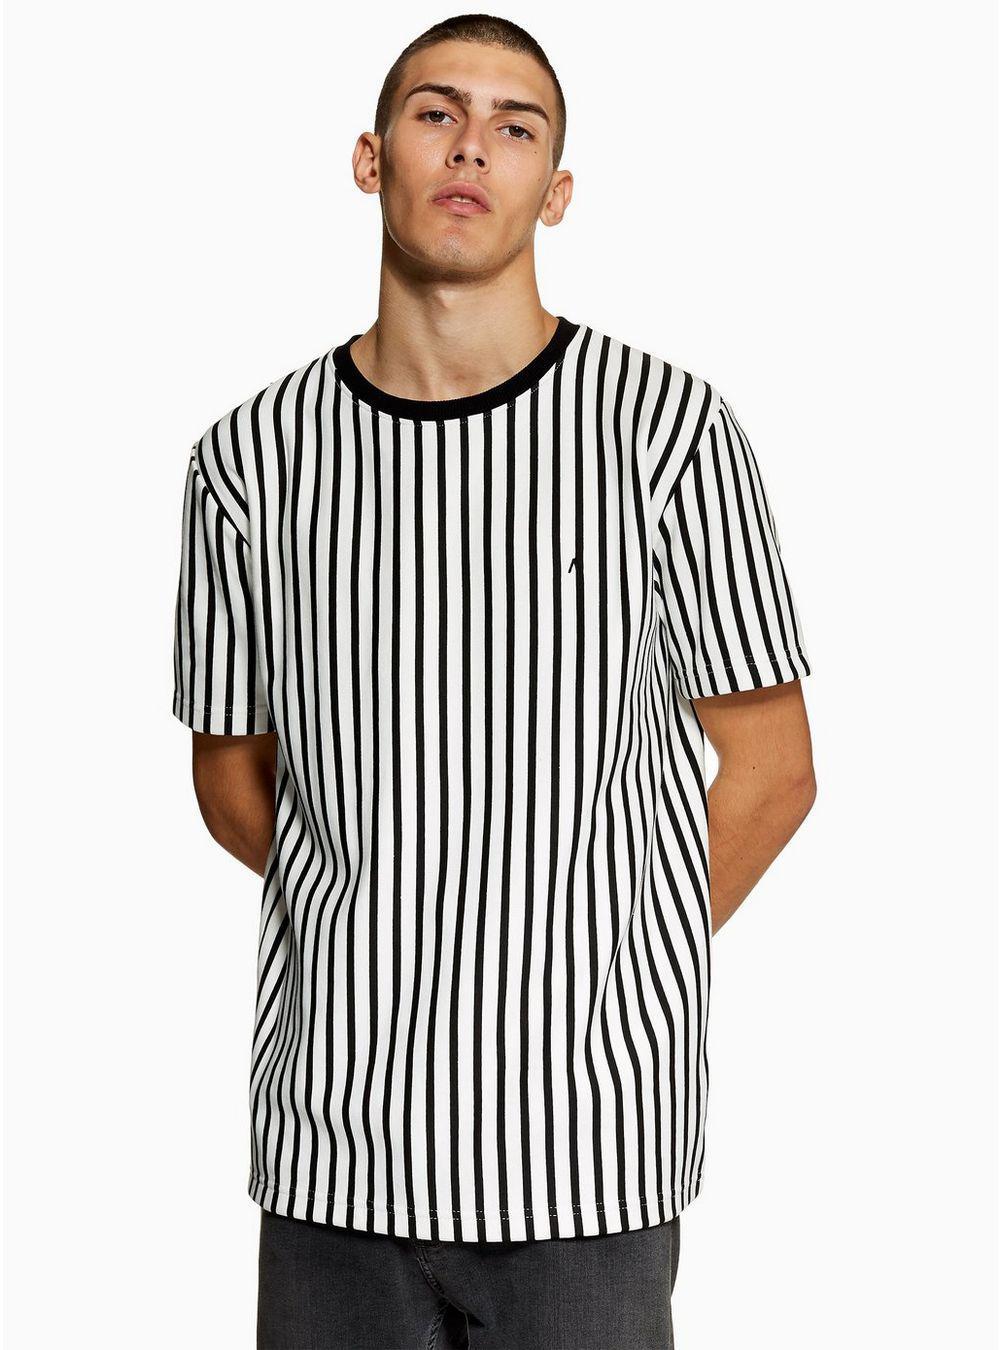 3c3ea3ee Antioch White College Stripe Short Sleeve Sweatshirt in White for ...